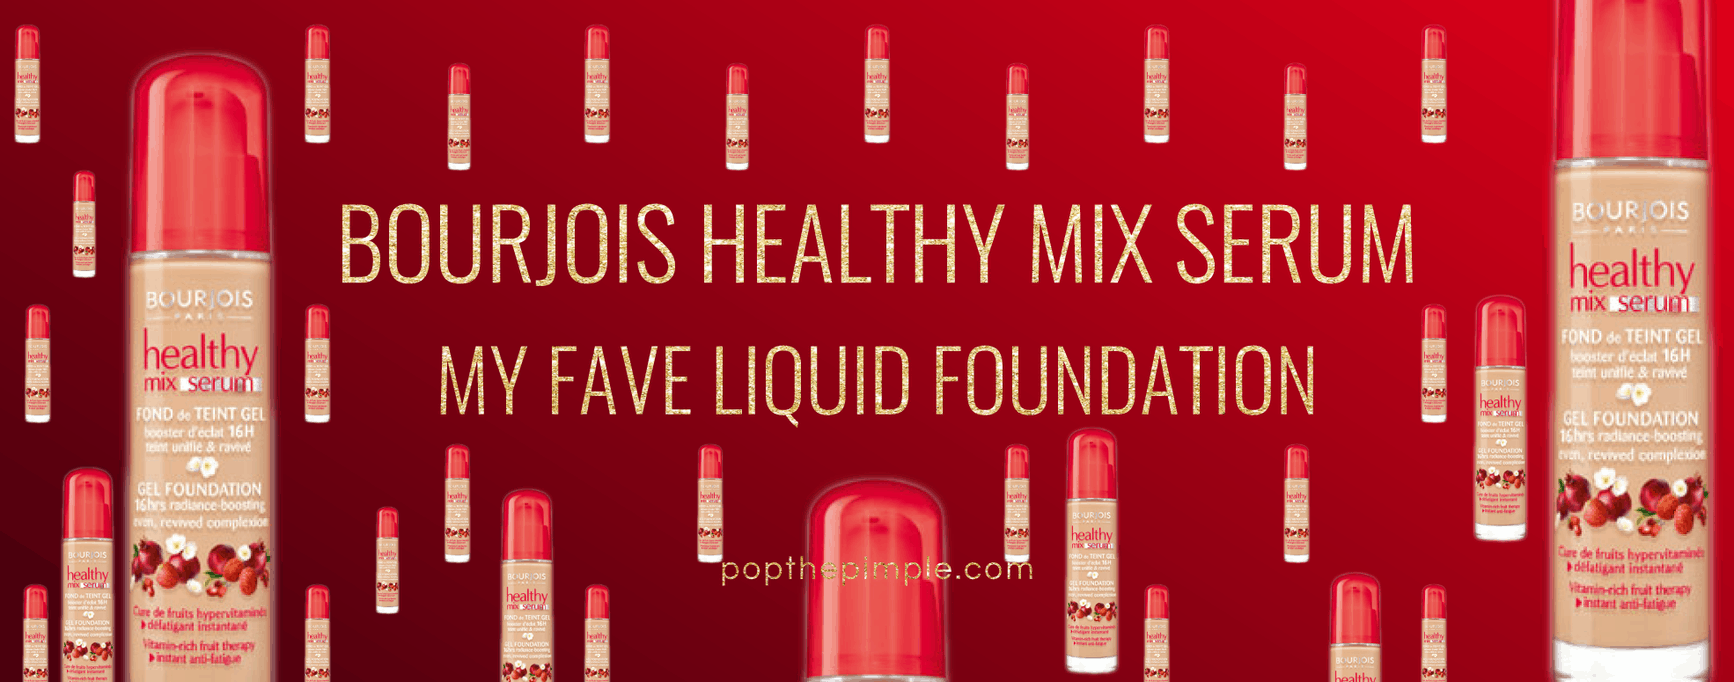 foundation for acne-prone skin, liquid foundation, chanel foundation dupe